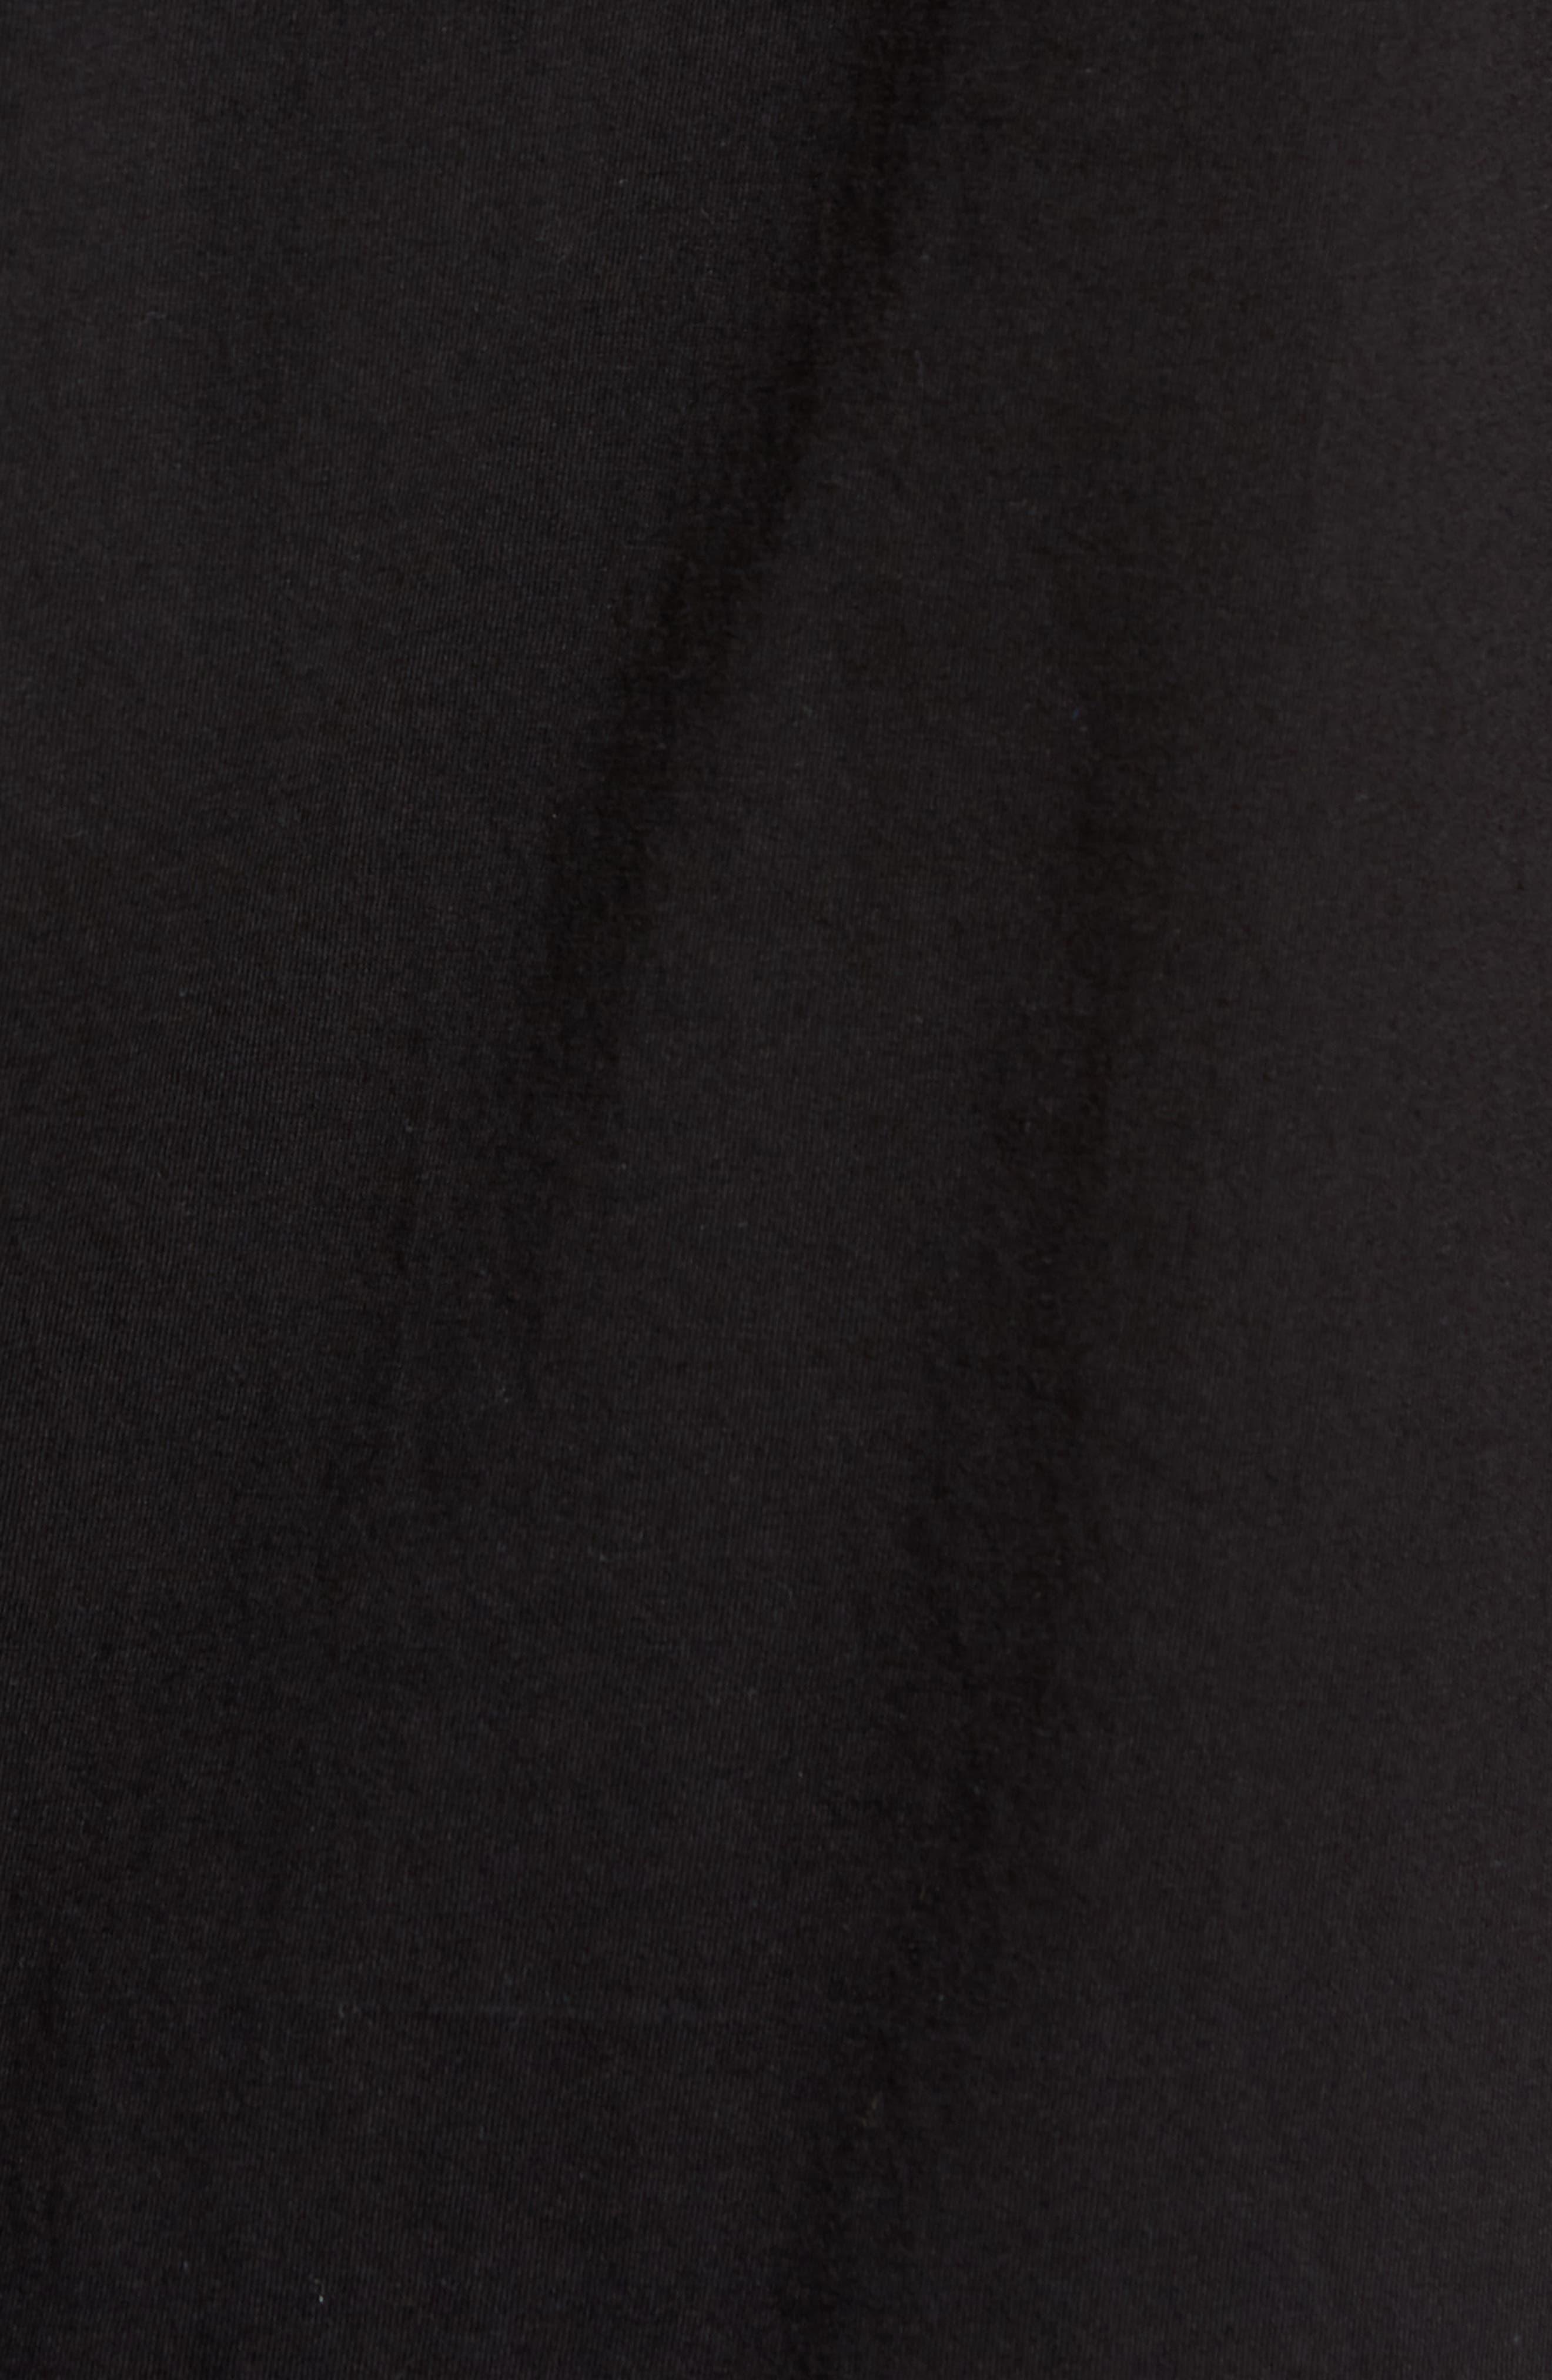 Square Root Graphic T-Shirt,                             Alternate thumbnail 5, color,                             Black